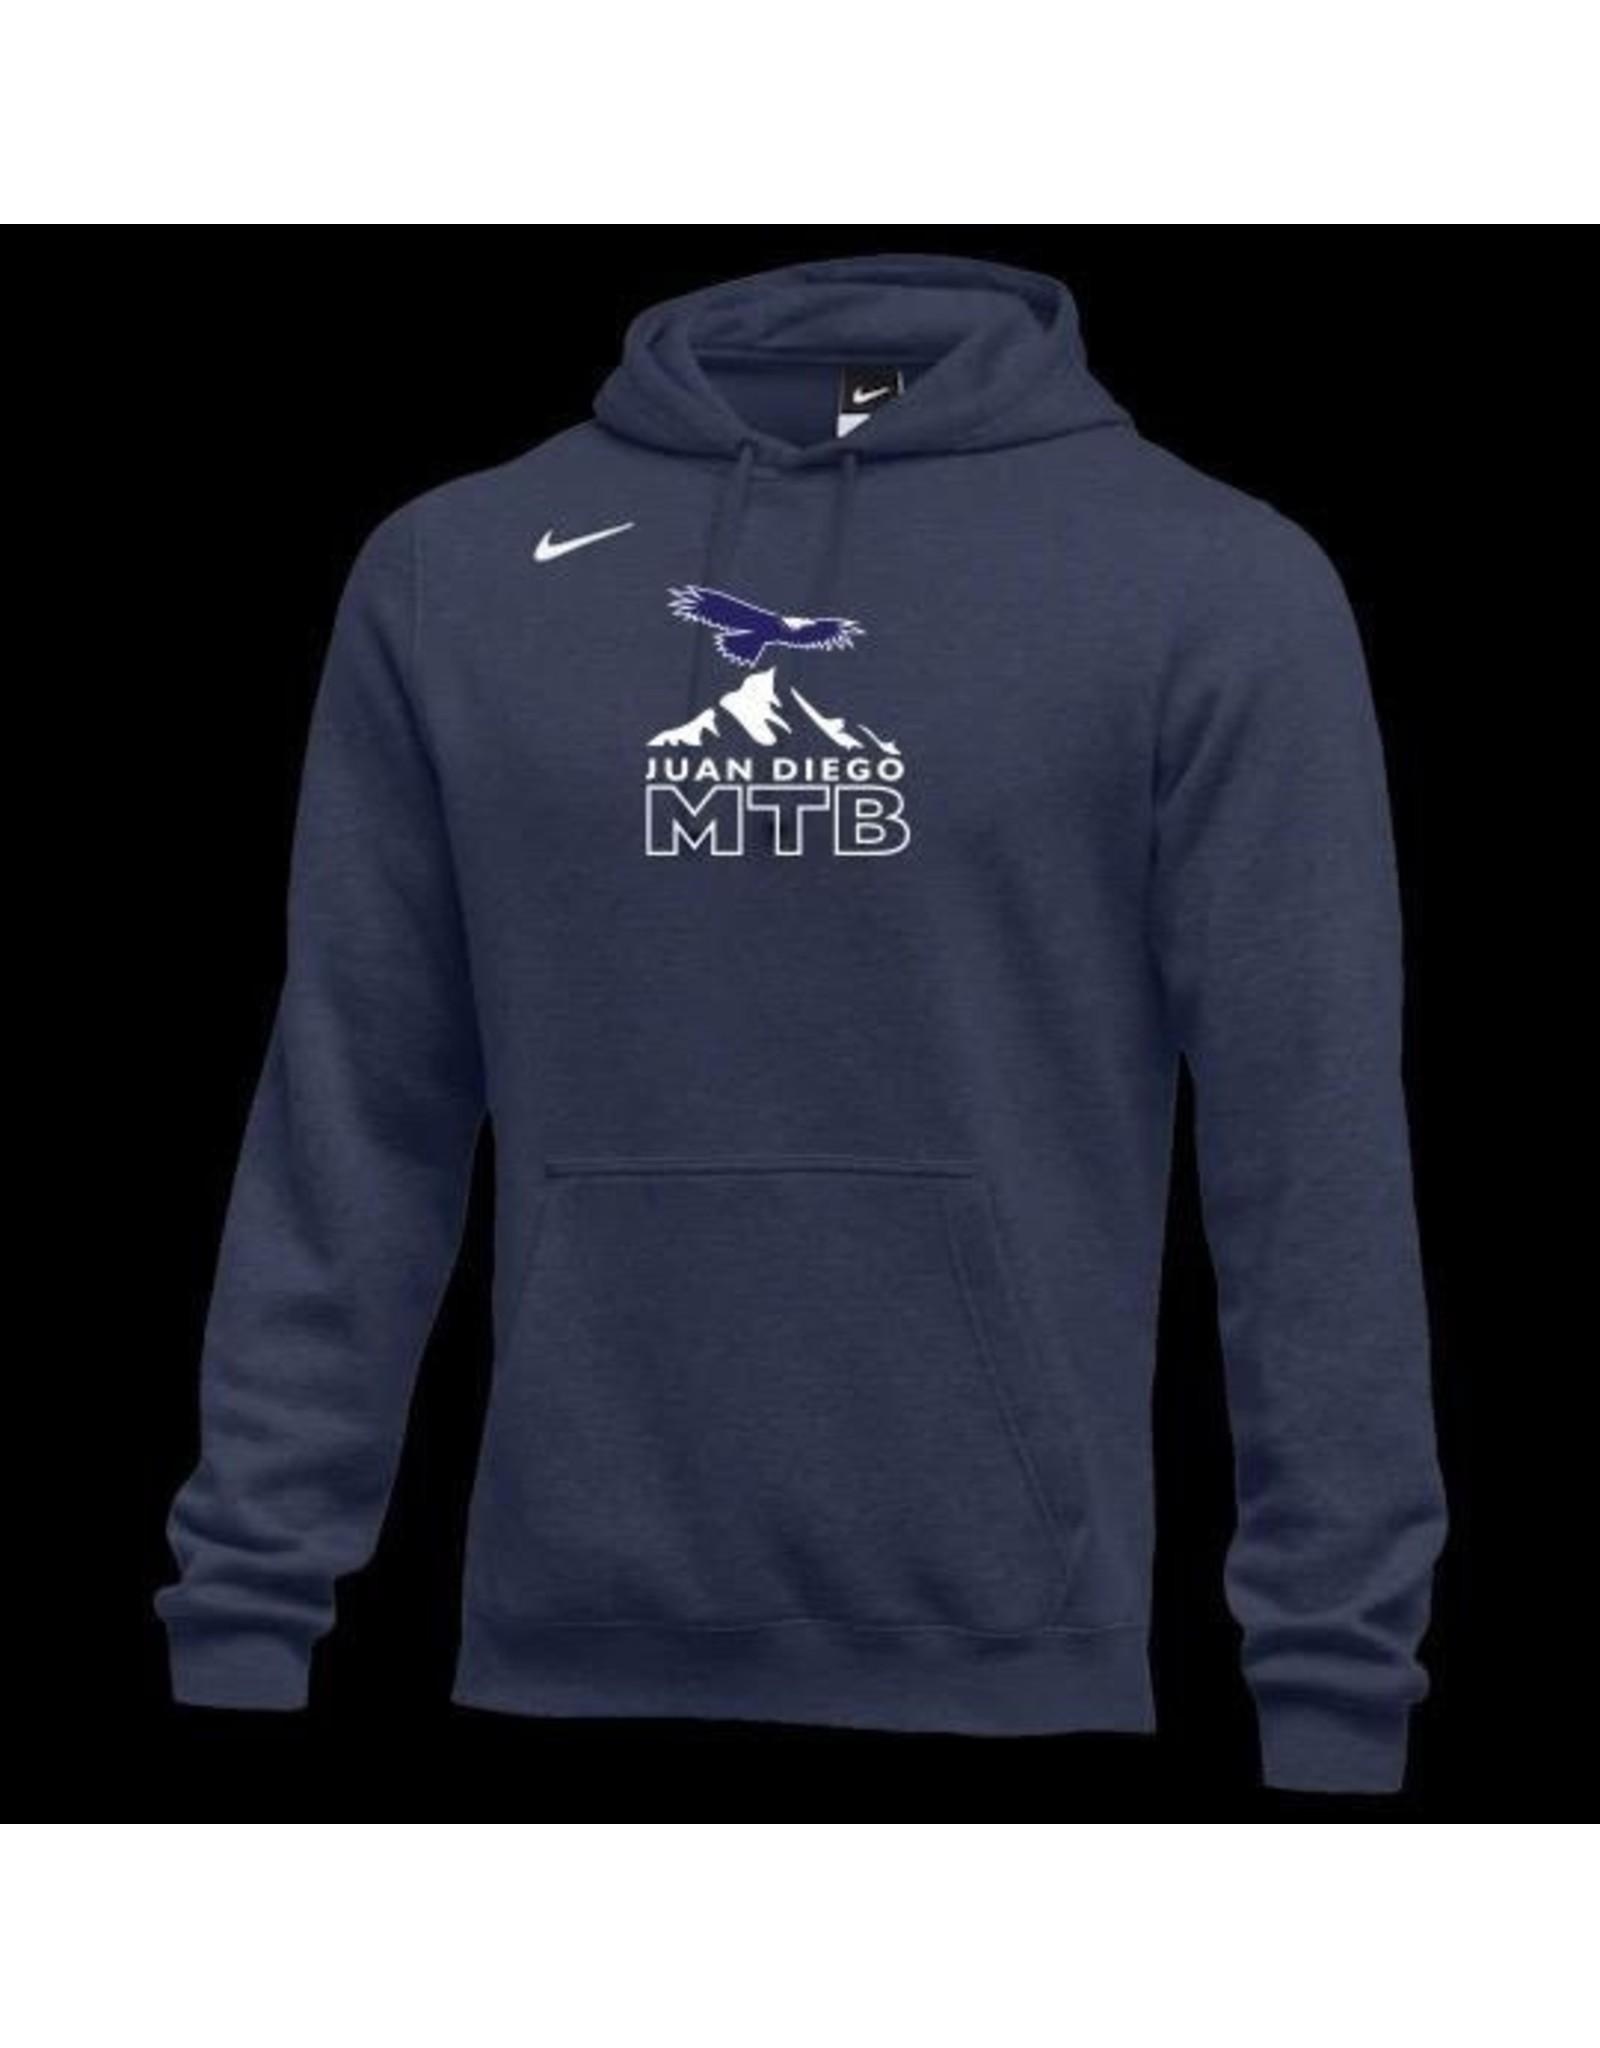 NON-UNIFORM Mountain Bike Team  Nike Club Fleece Sweatshirt